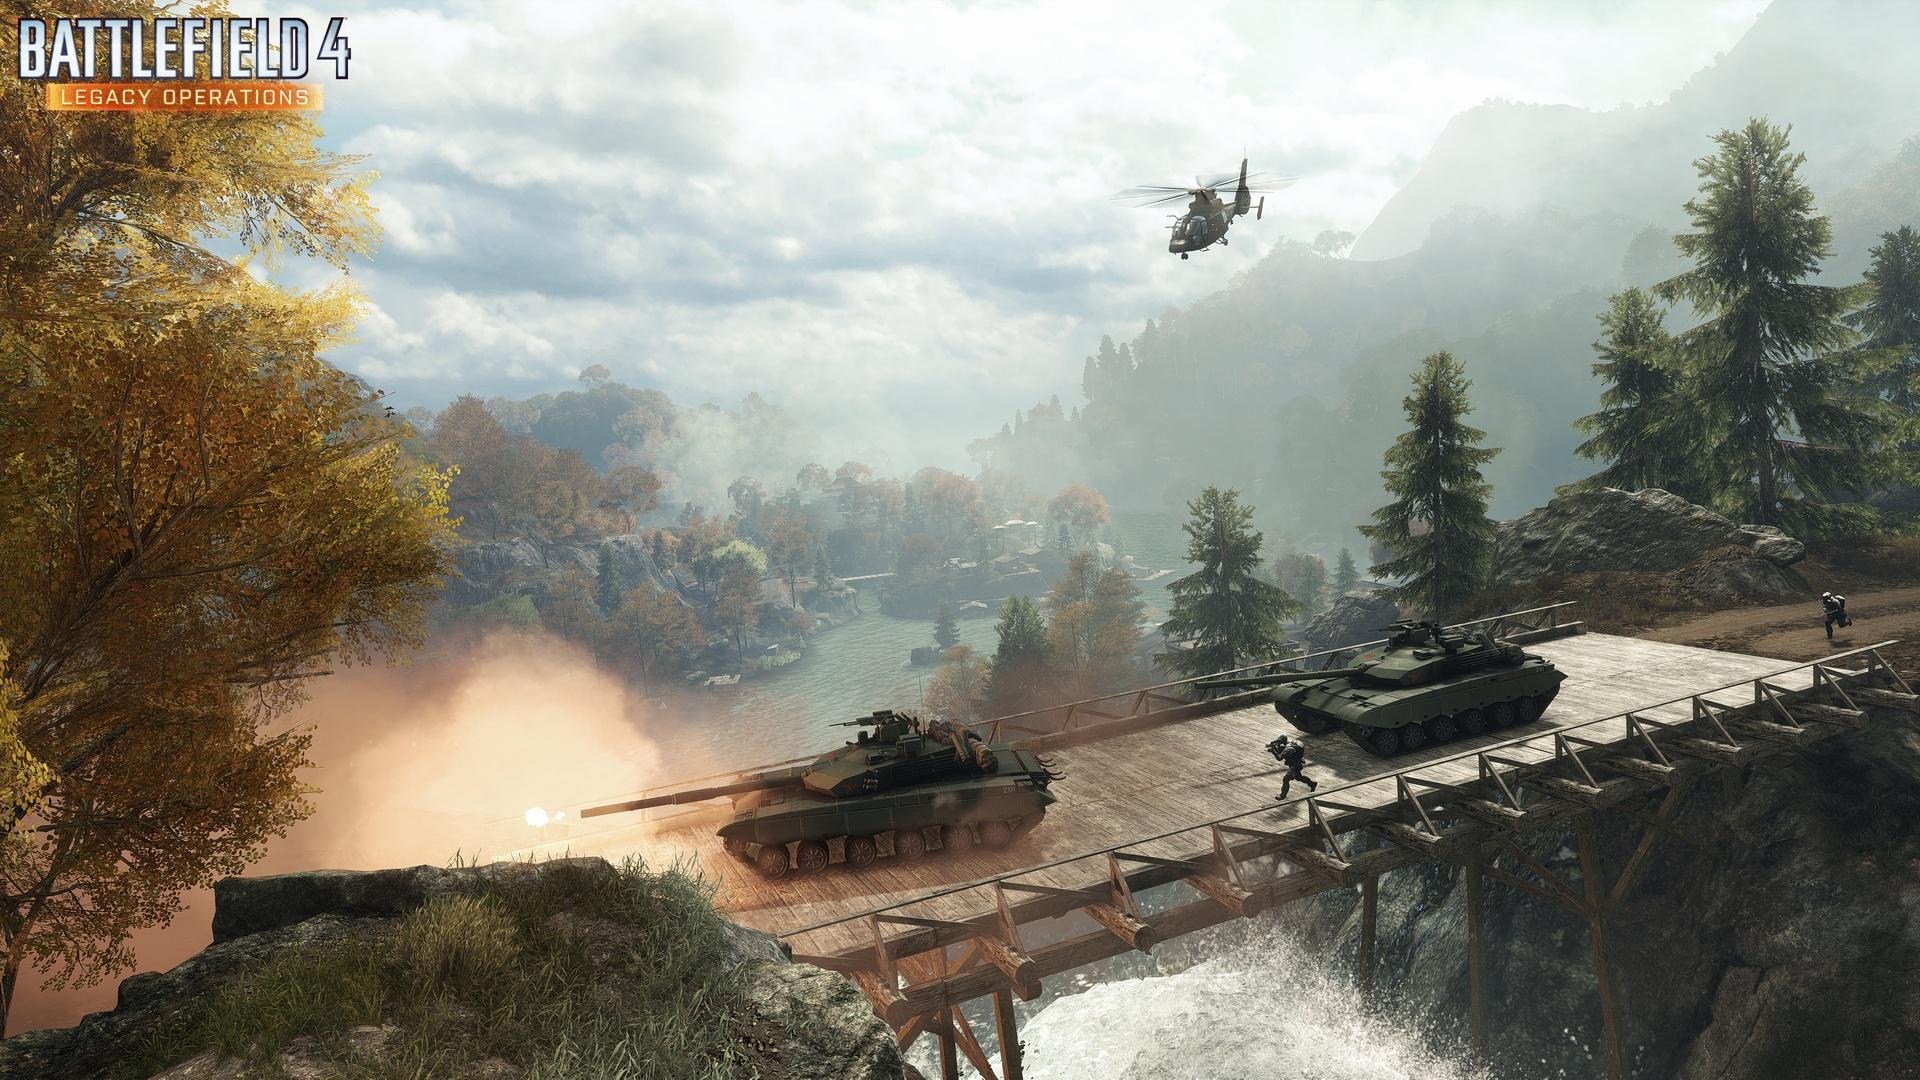 bf4_legacy_ops_screenshot_action_01_bridge_tanks_wm